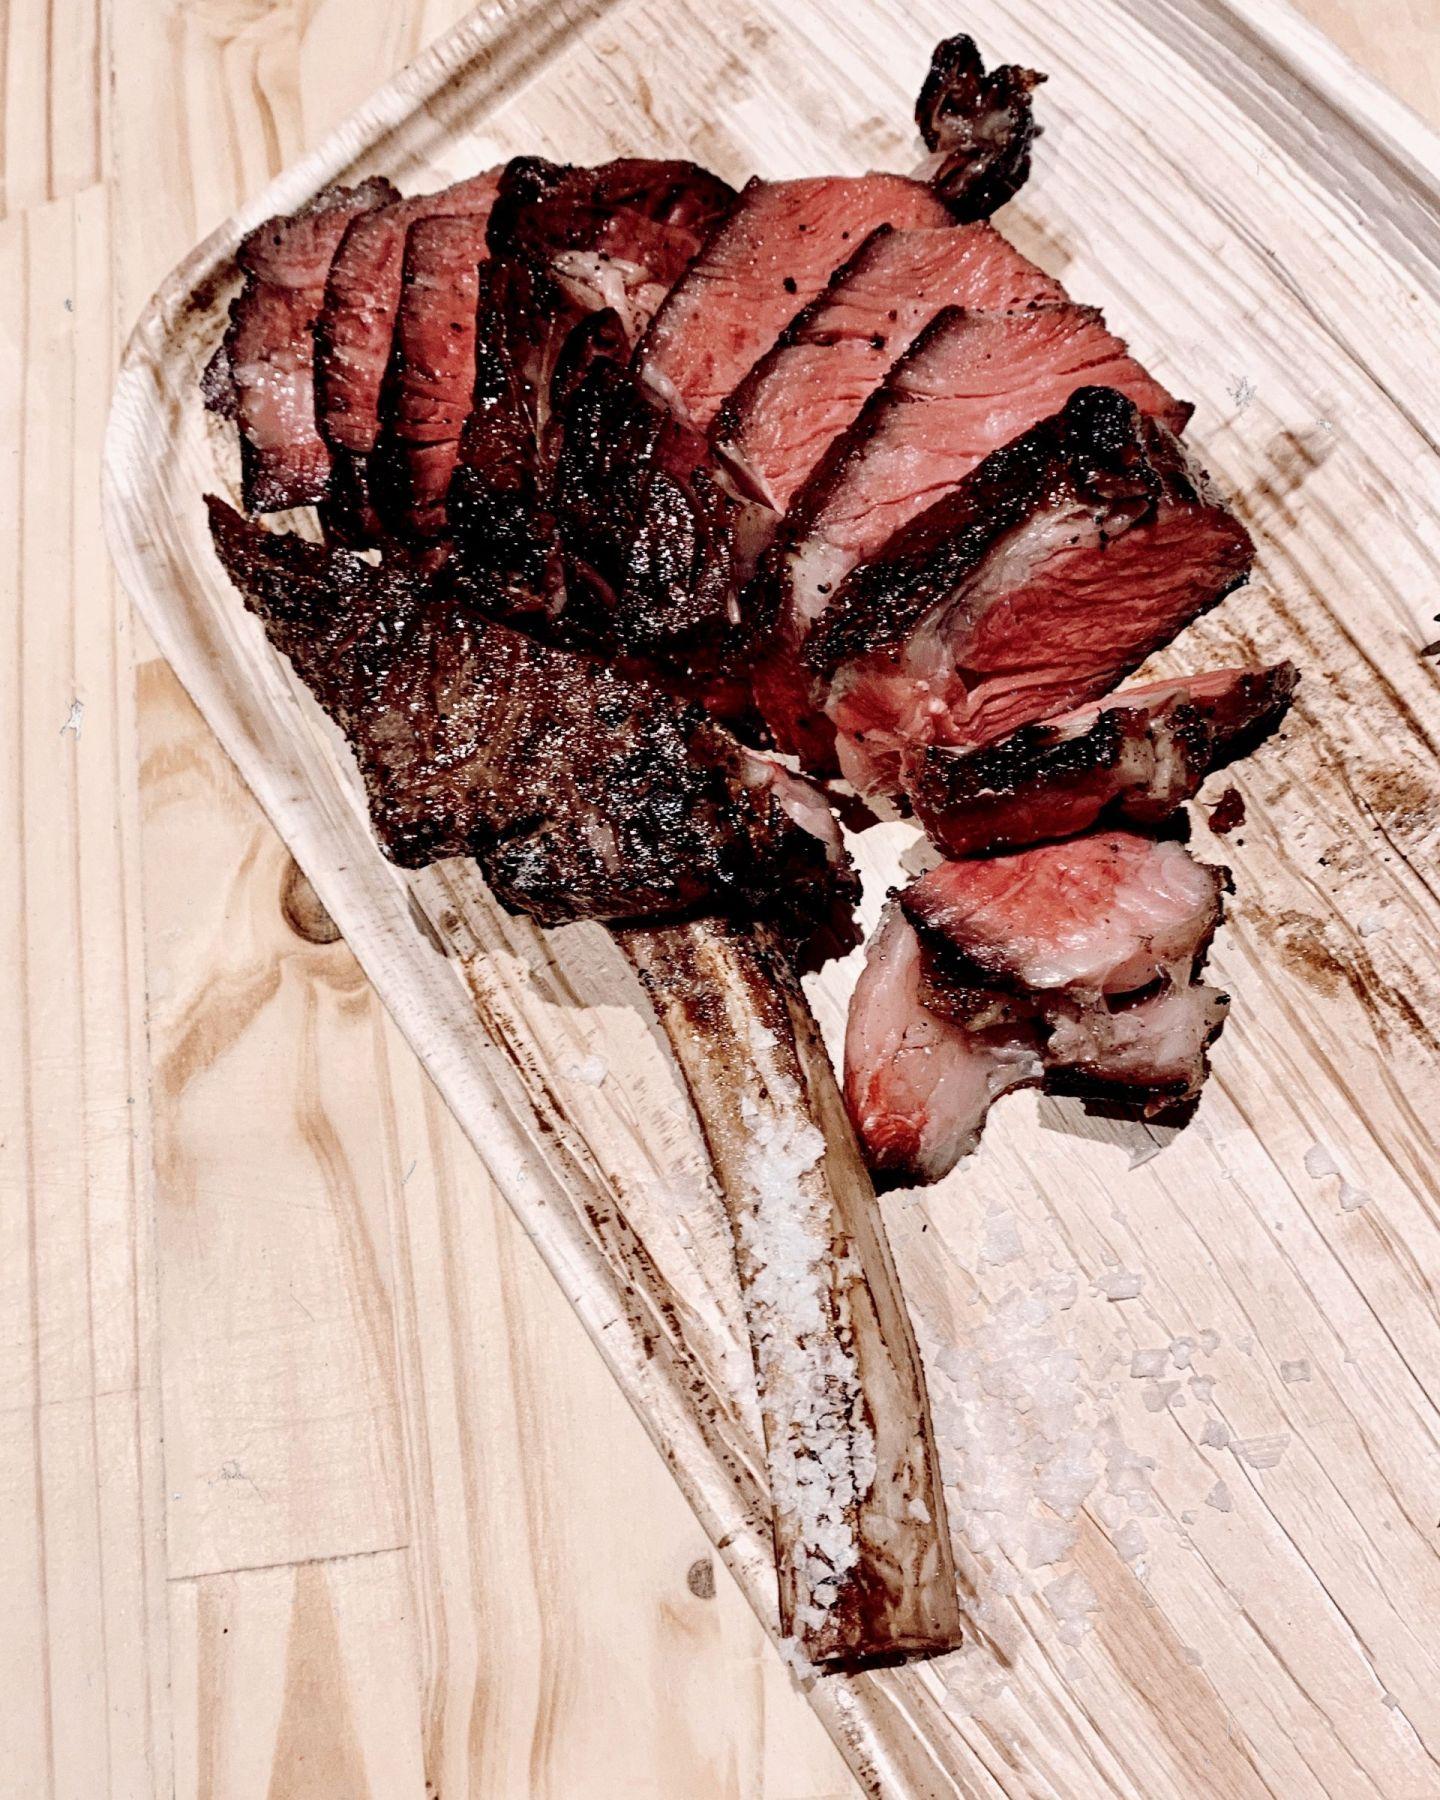 40 oz creekstone steak